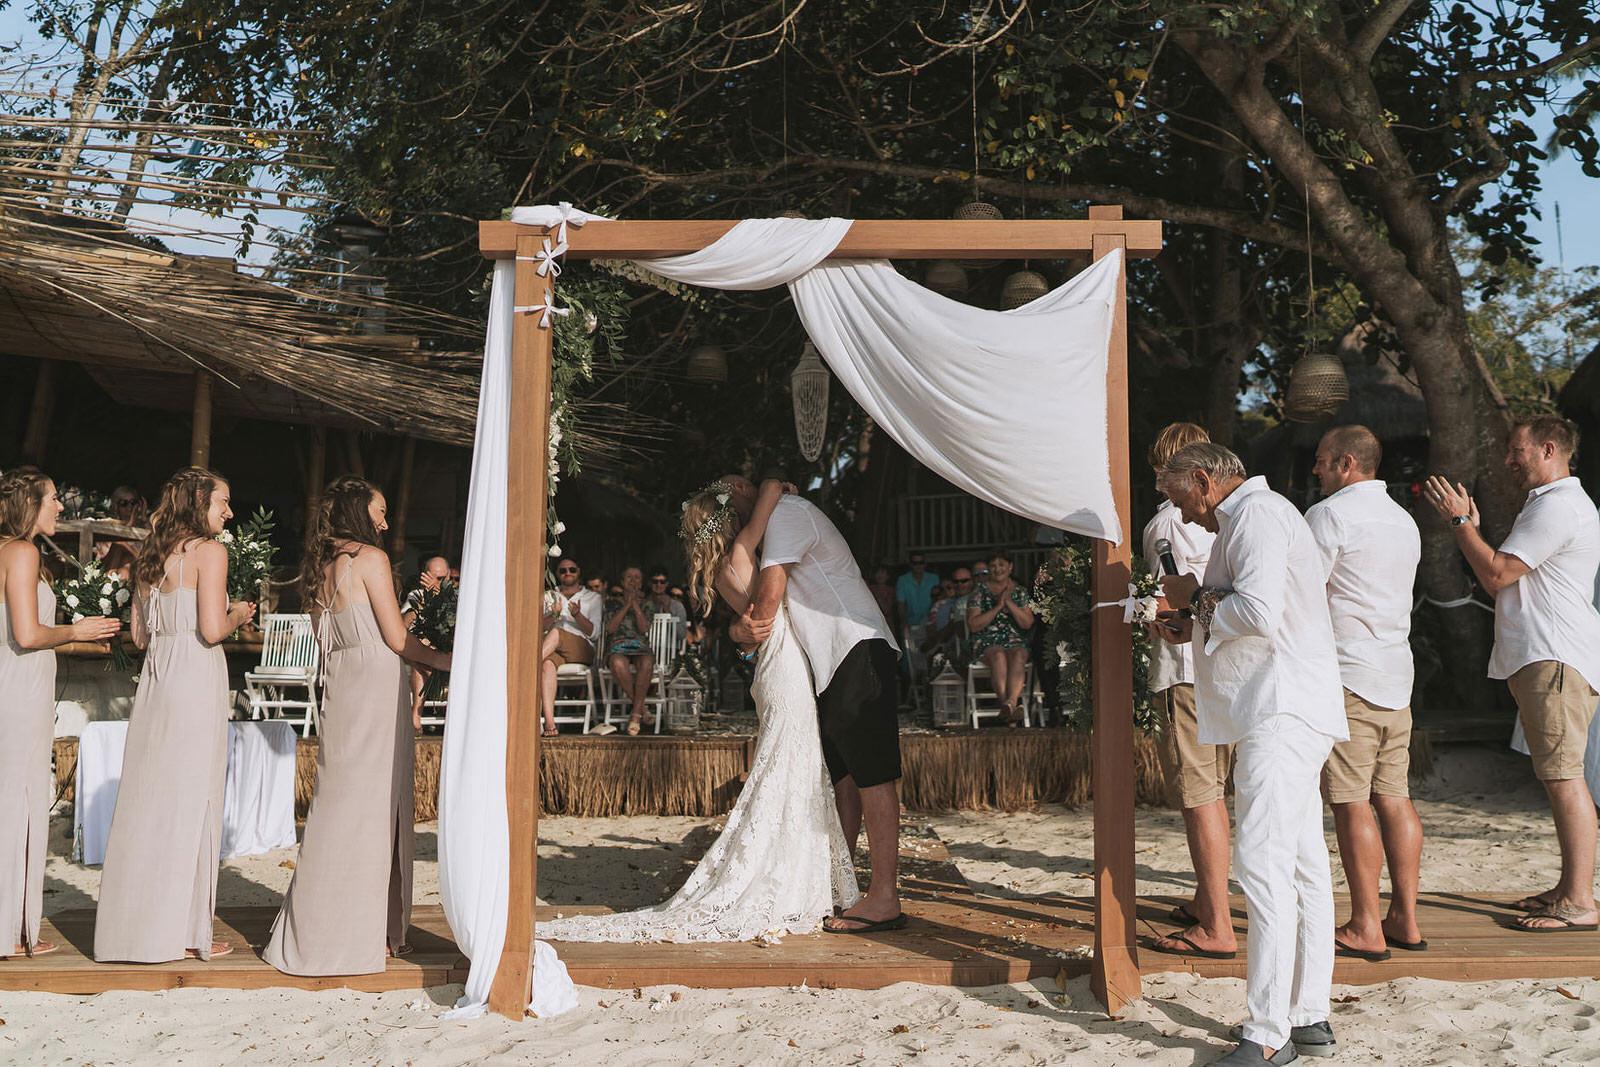 newfound-hai-tide-nusa-lembongan-bali-wedding-photographers-119